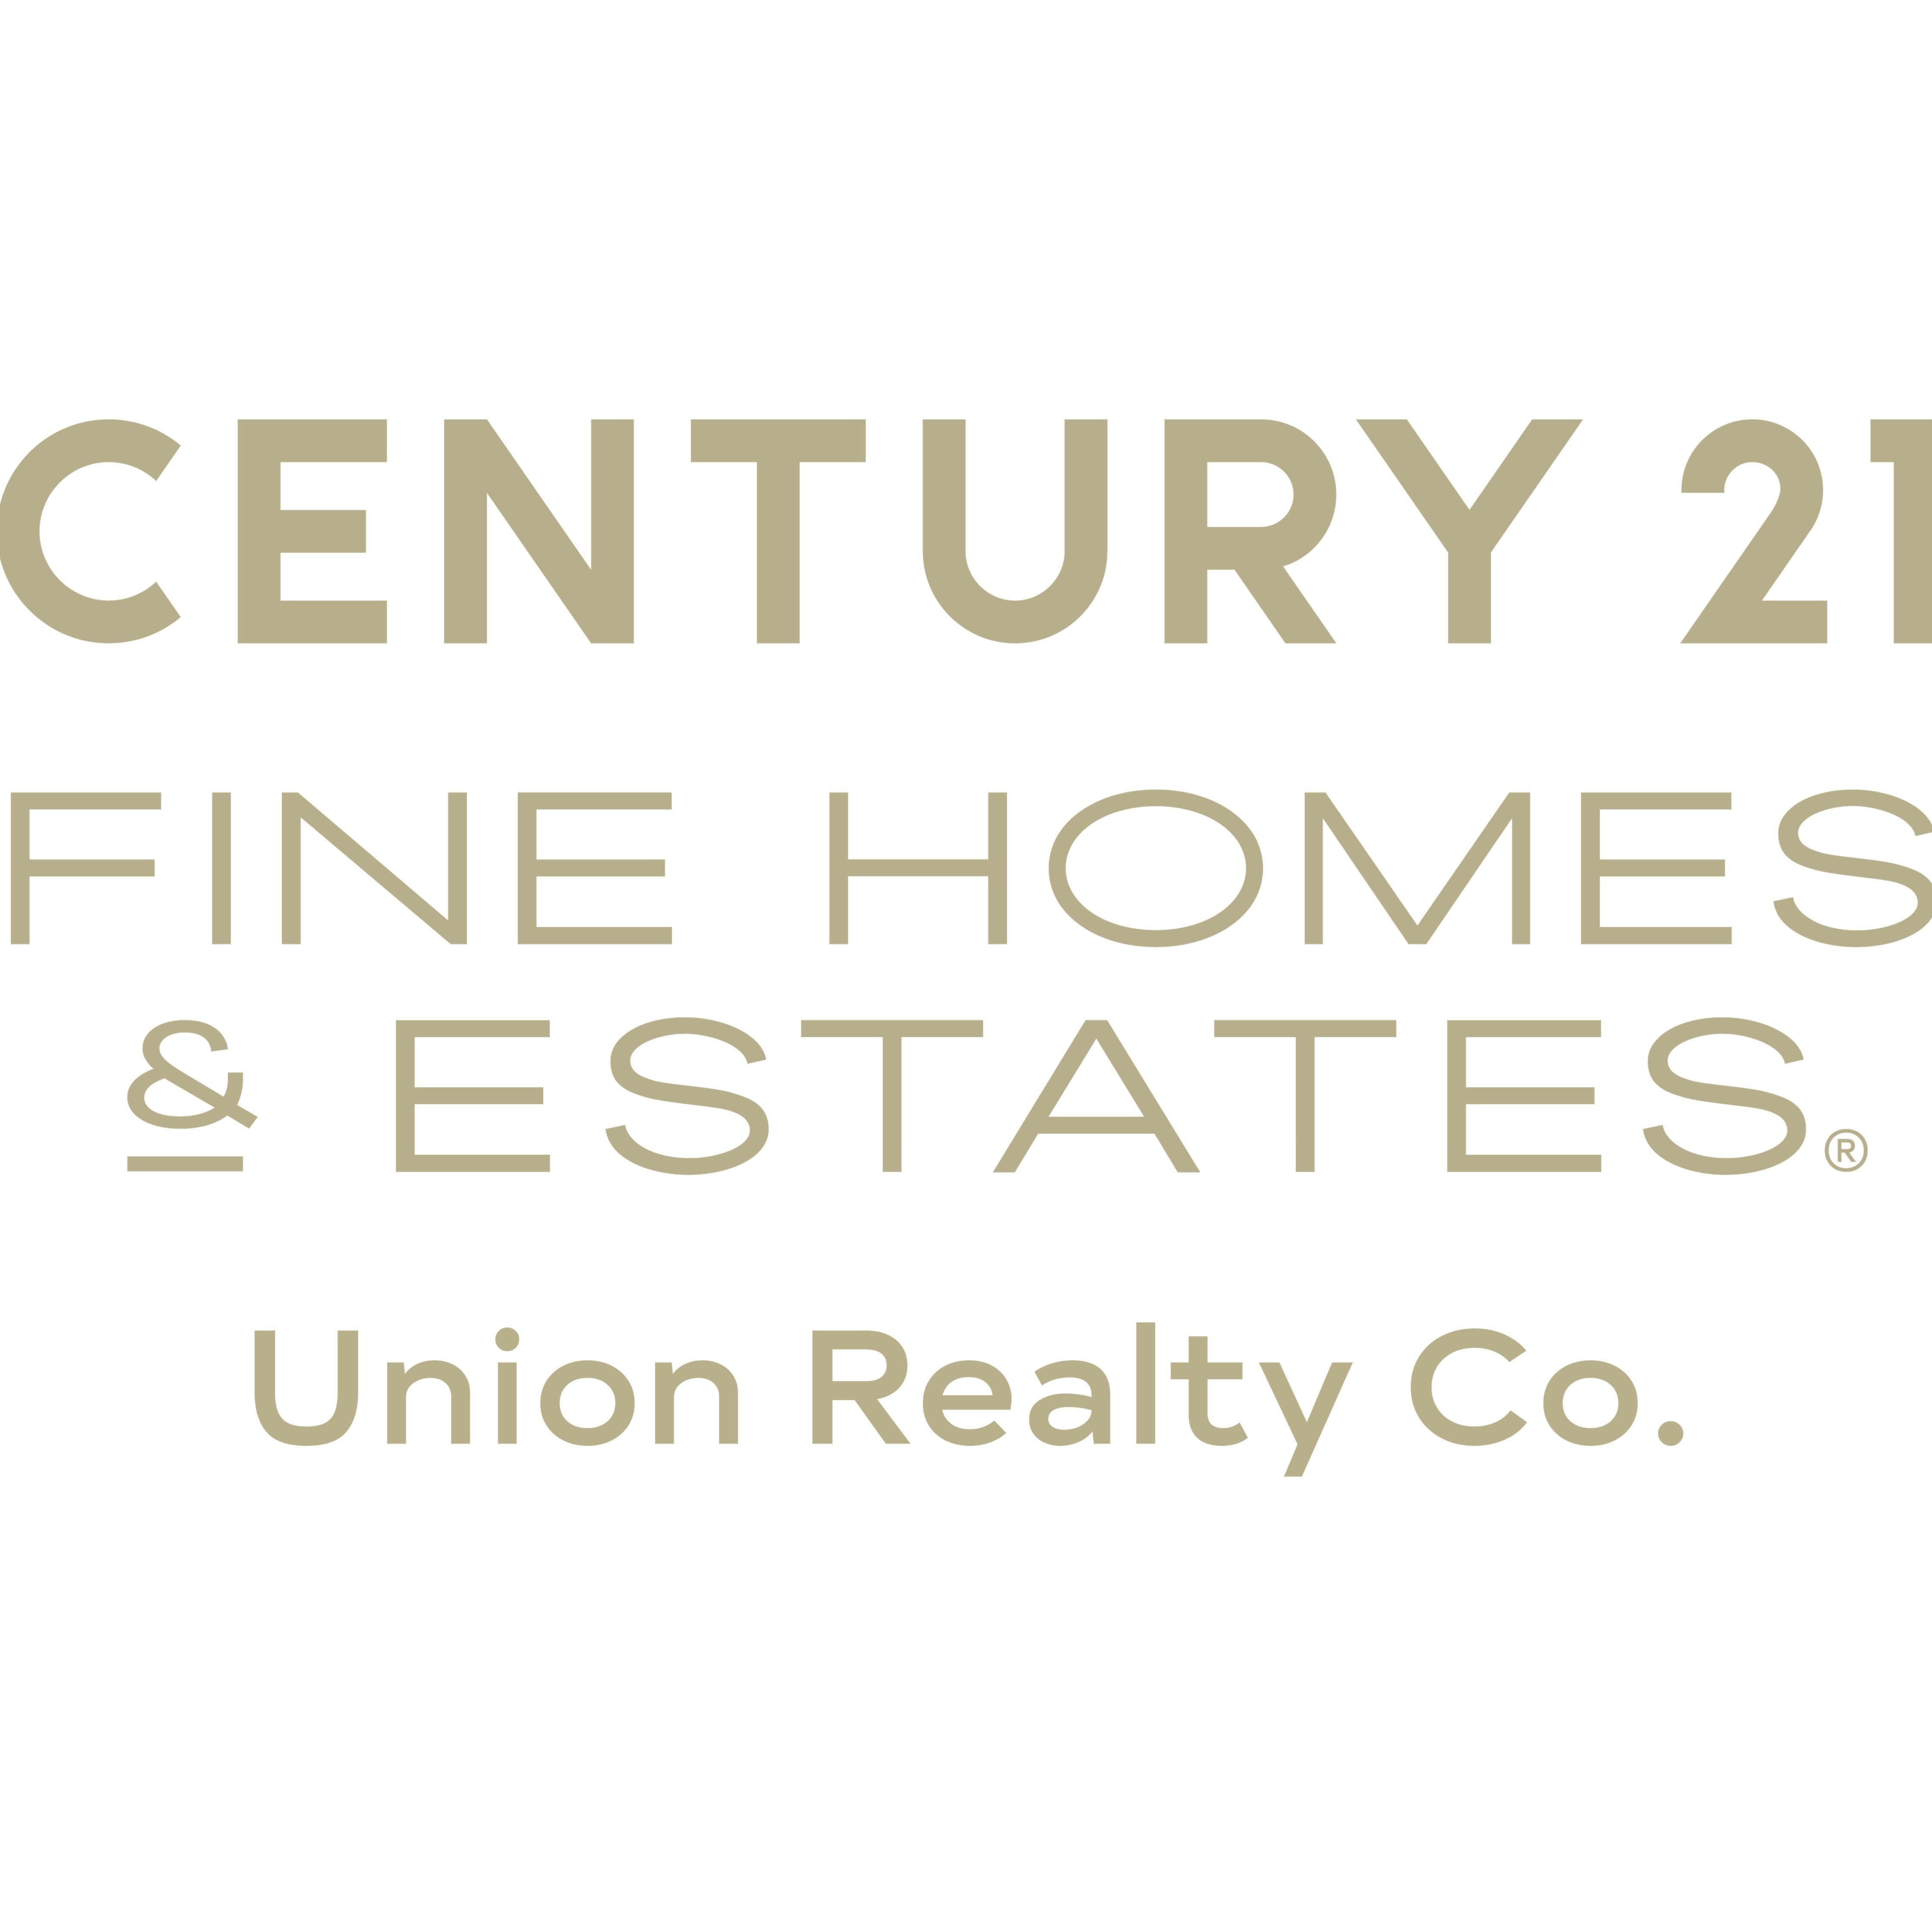 Century 21 Union Realty Co.